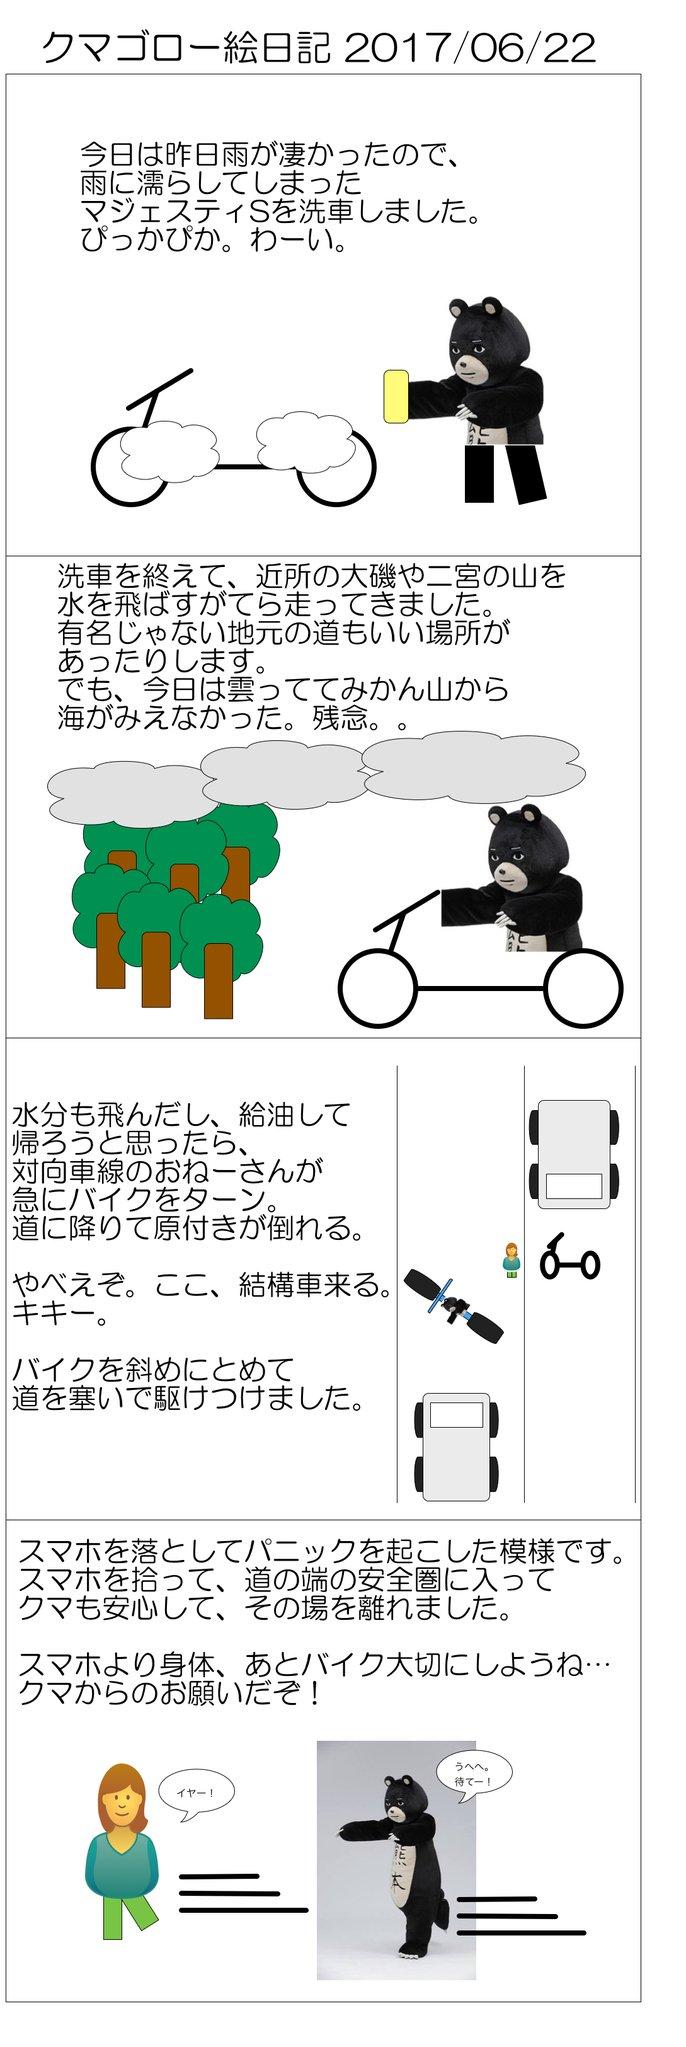 https://cdn-ak2.f.st-hatena.com/images/fotolife/k/kumagoro_bike/20170629/20170629064045_original.jpg